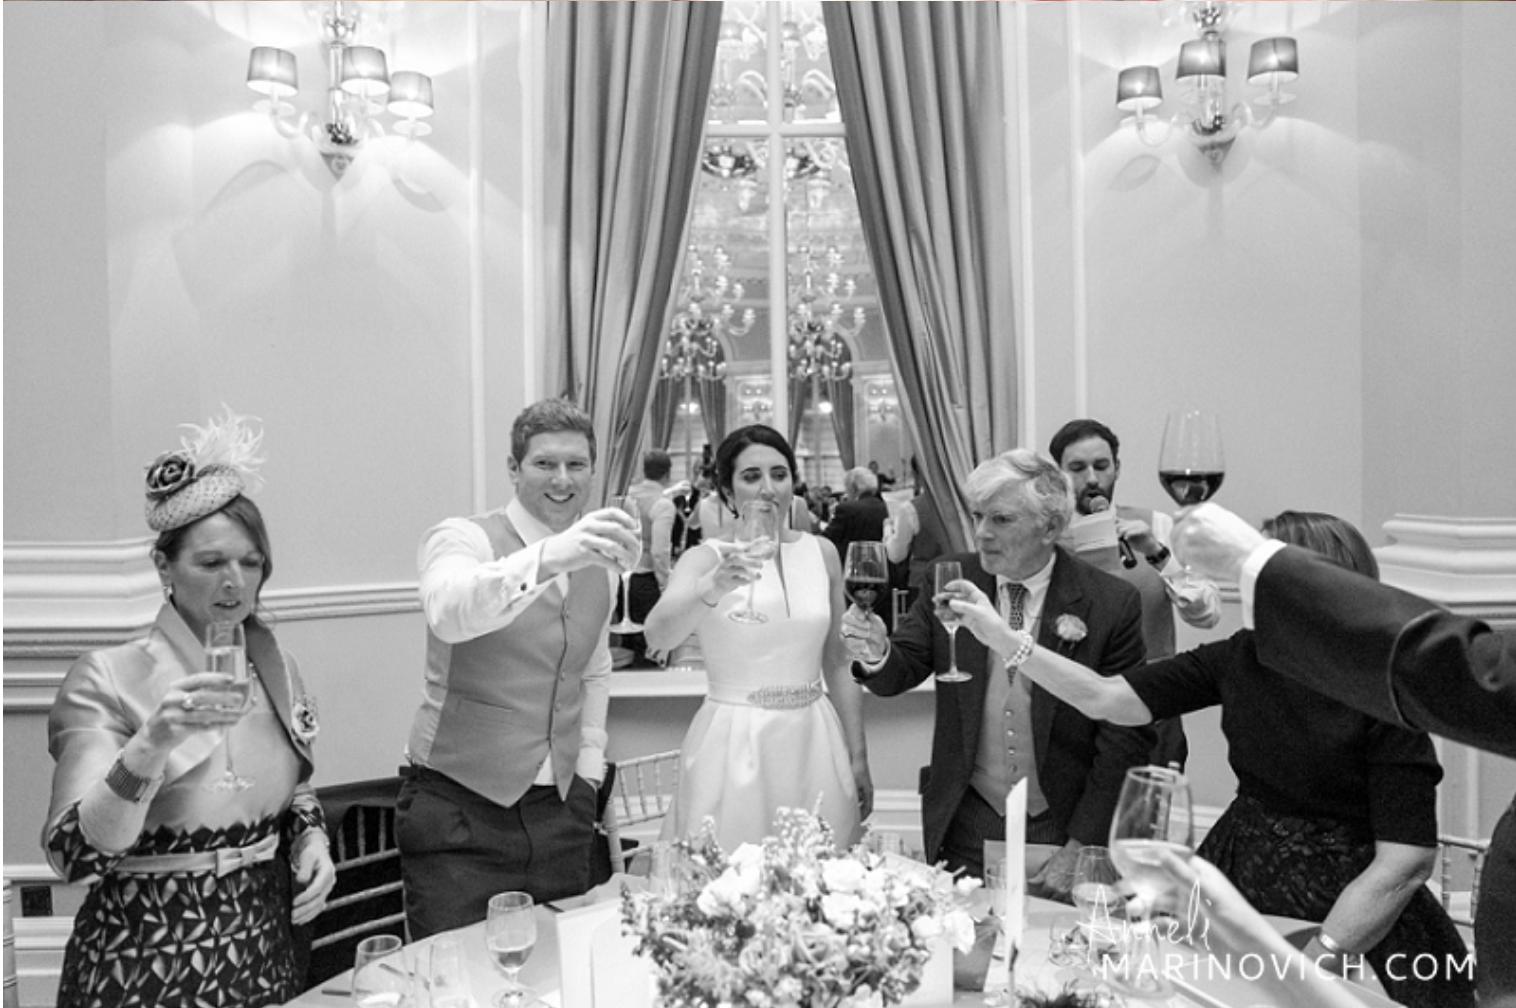 Corinthia Hotel London Wedding Bride and Groom